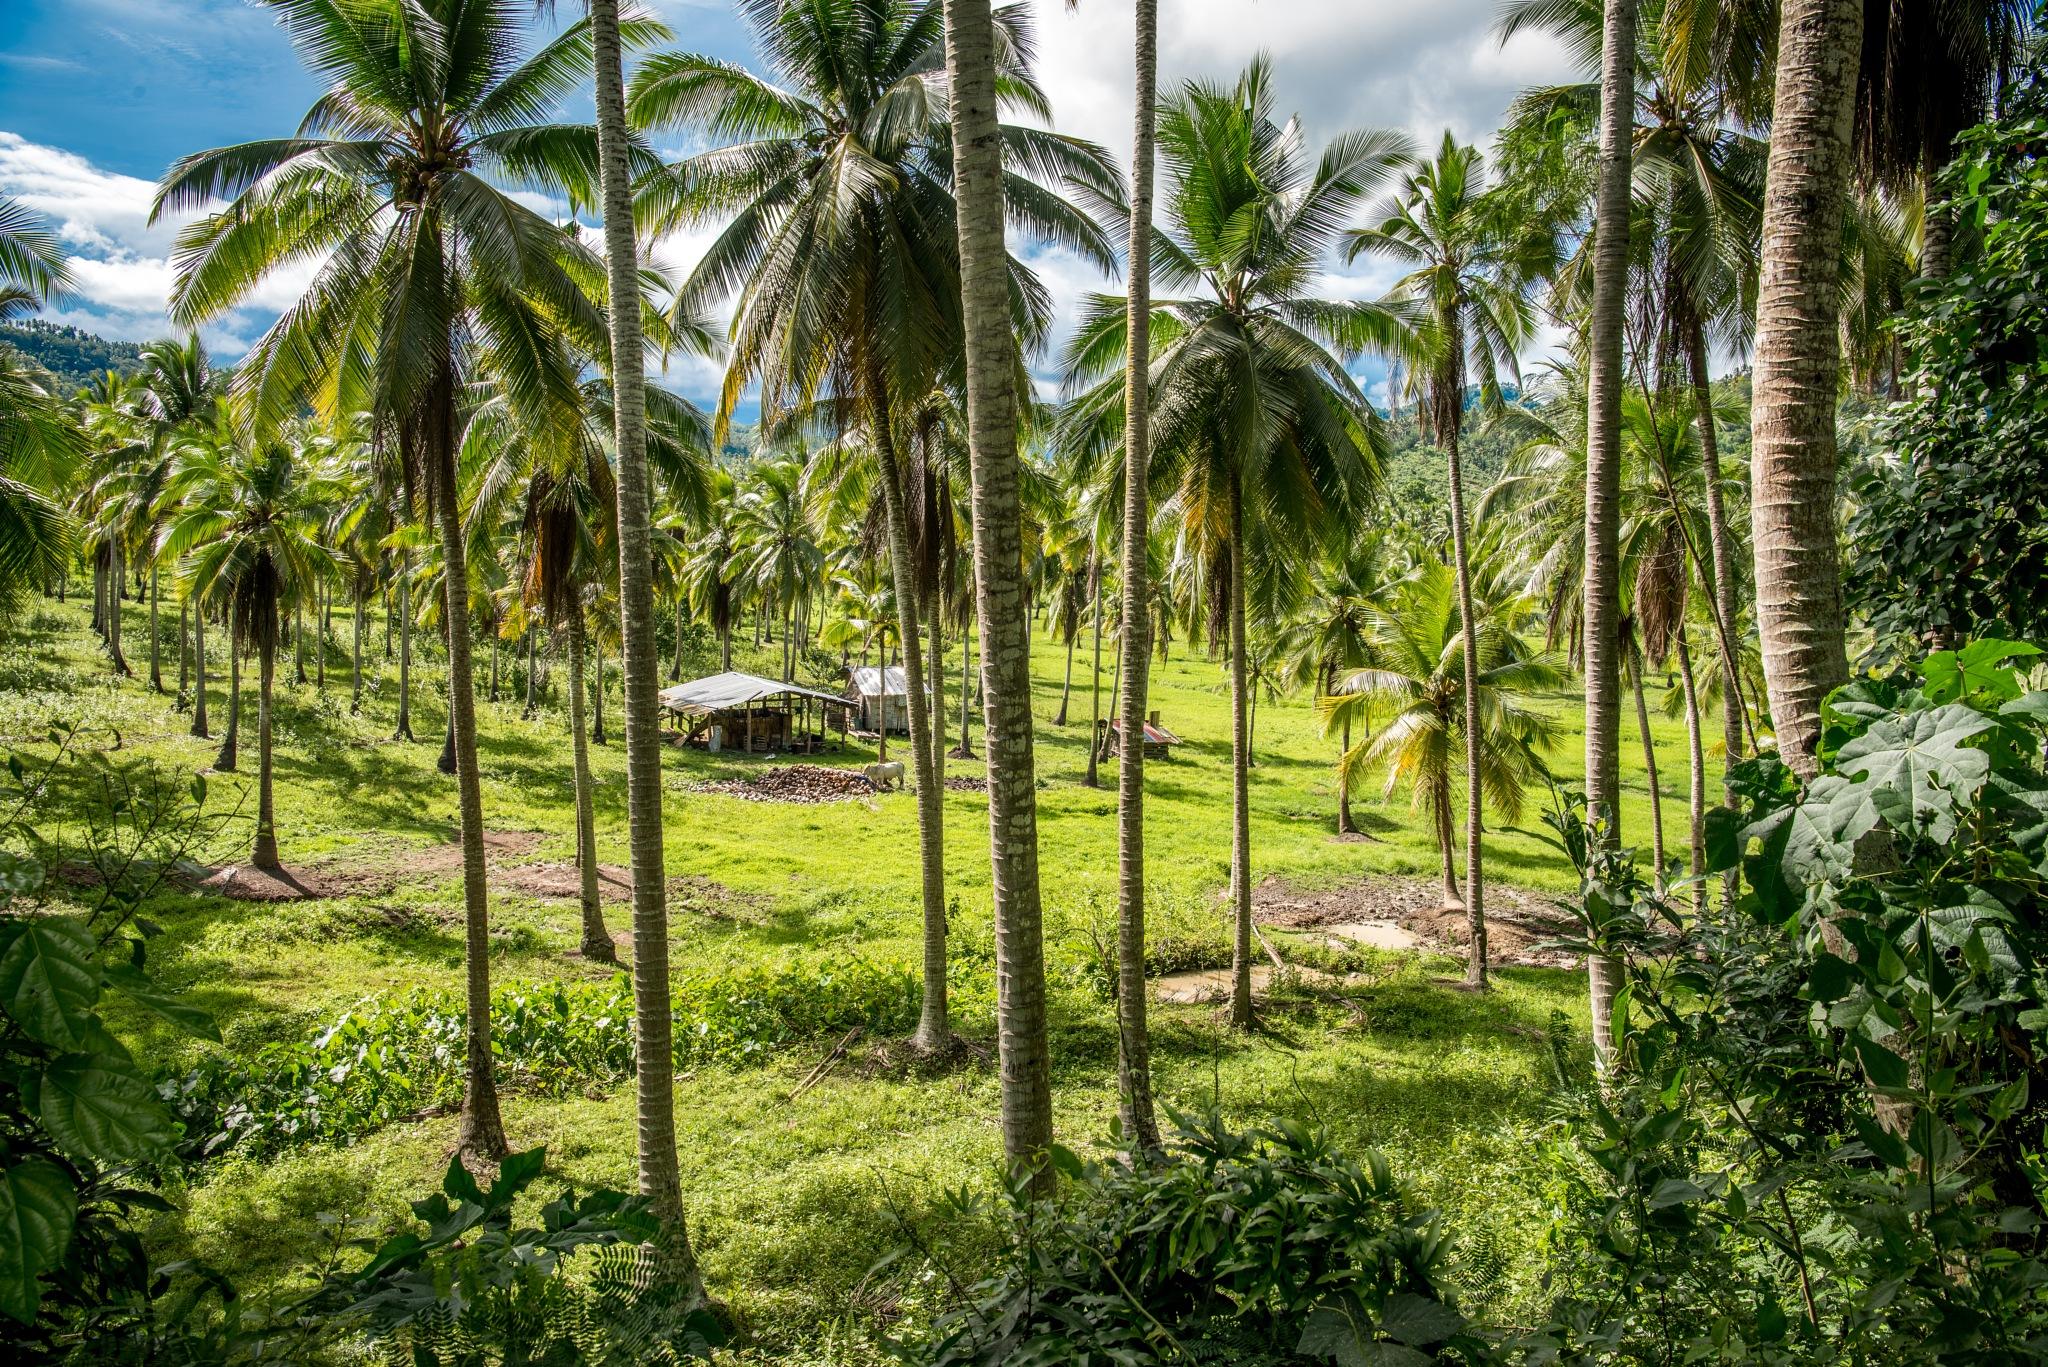 The small coconut farm by Ole Morten Eyra